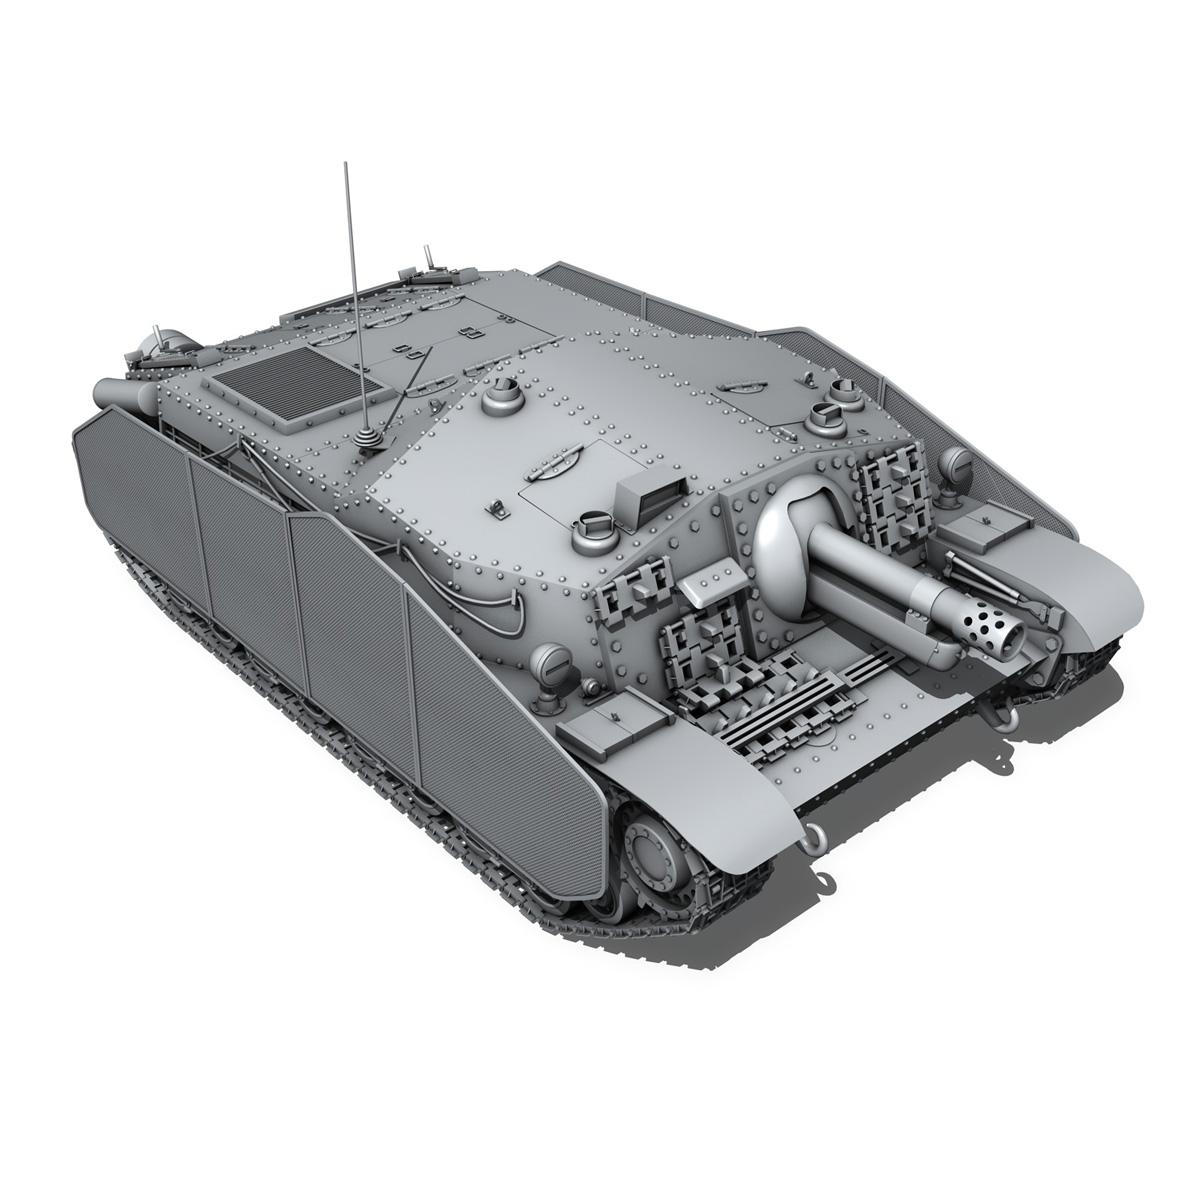 43m zrinyi ii - Macar hücum silahı 3d model 3ds fbx c4d lwo obj 251635